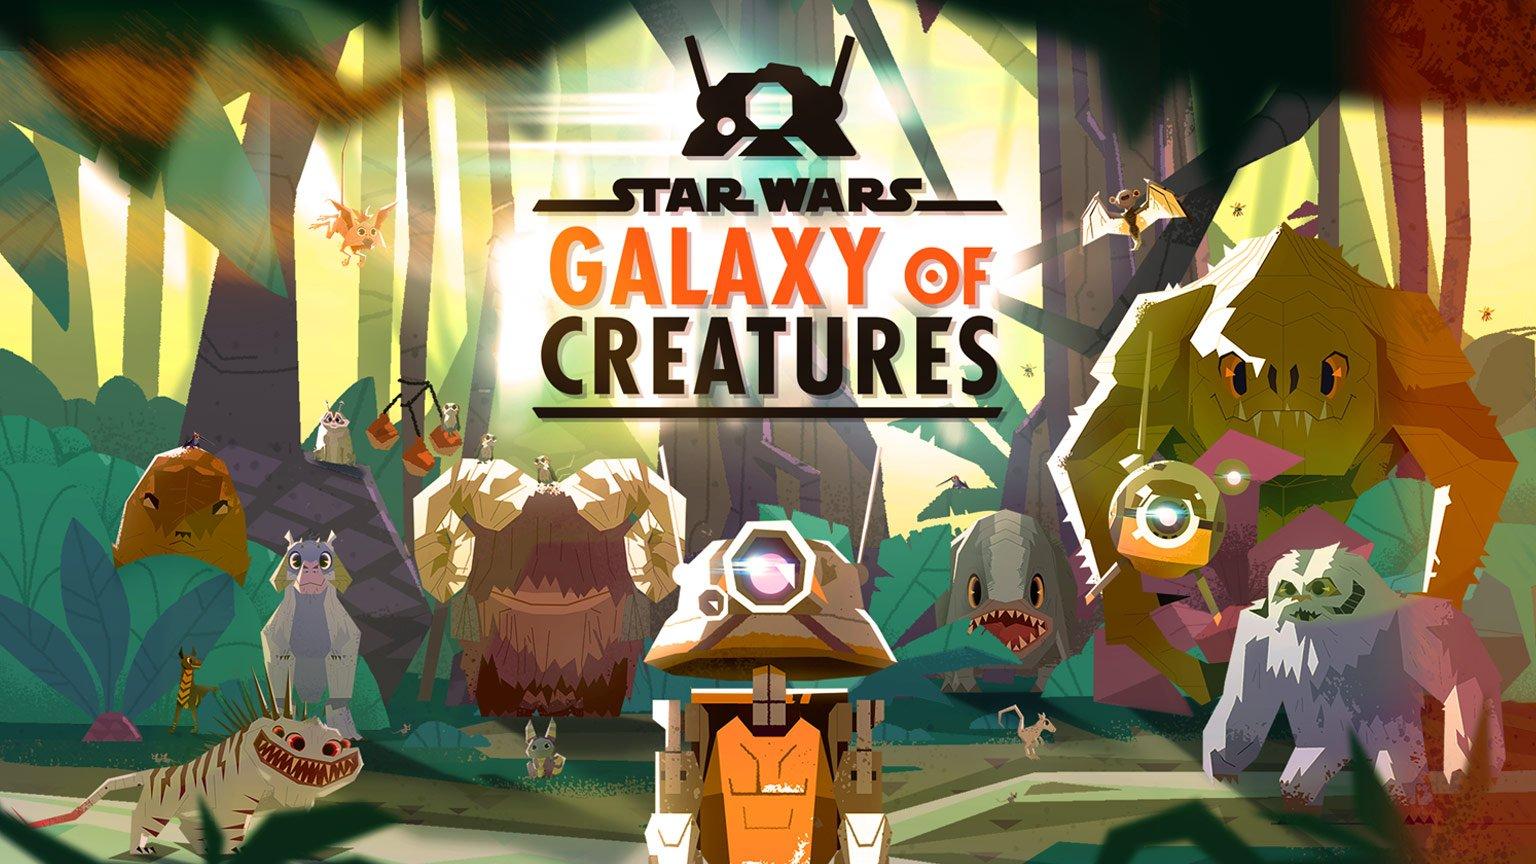 Star Wars: Galaxy of Creatures